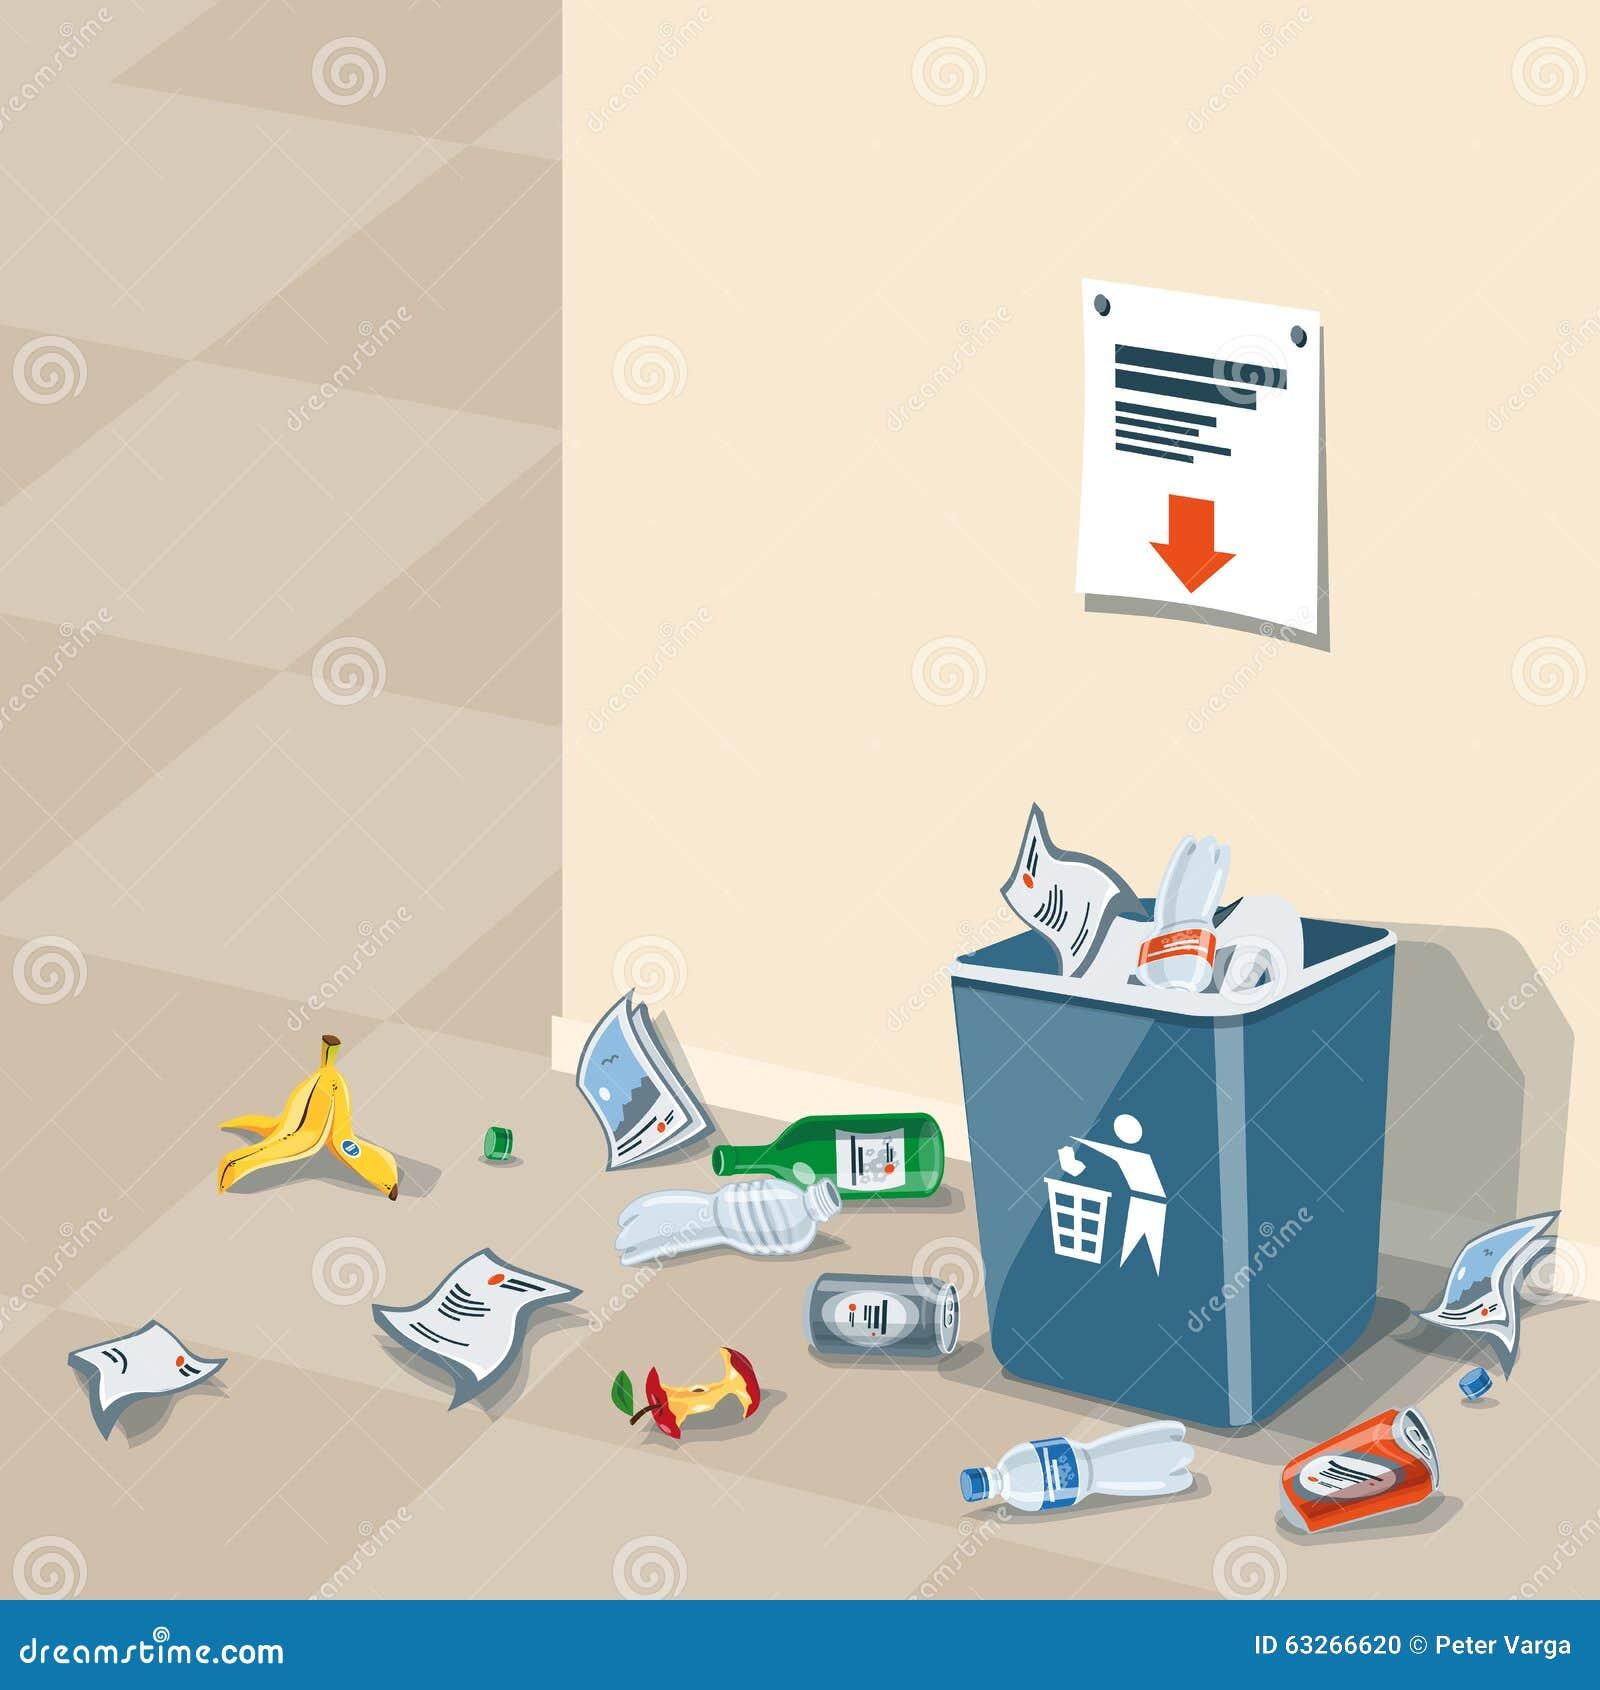 No Garbage On Floor : Littering garbage around the trash bin stock vector